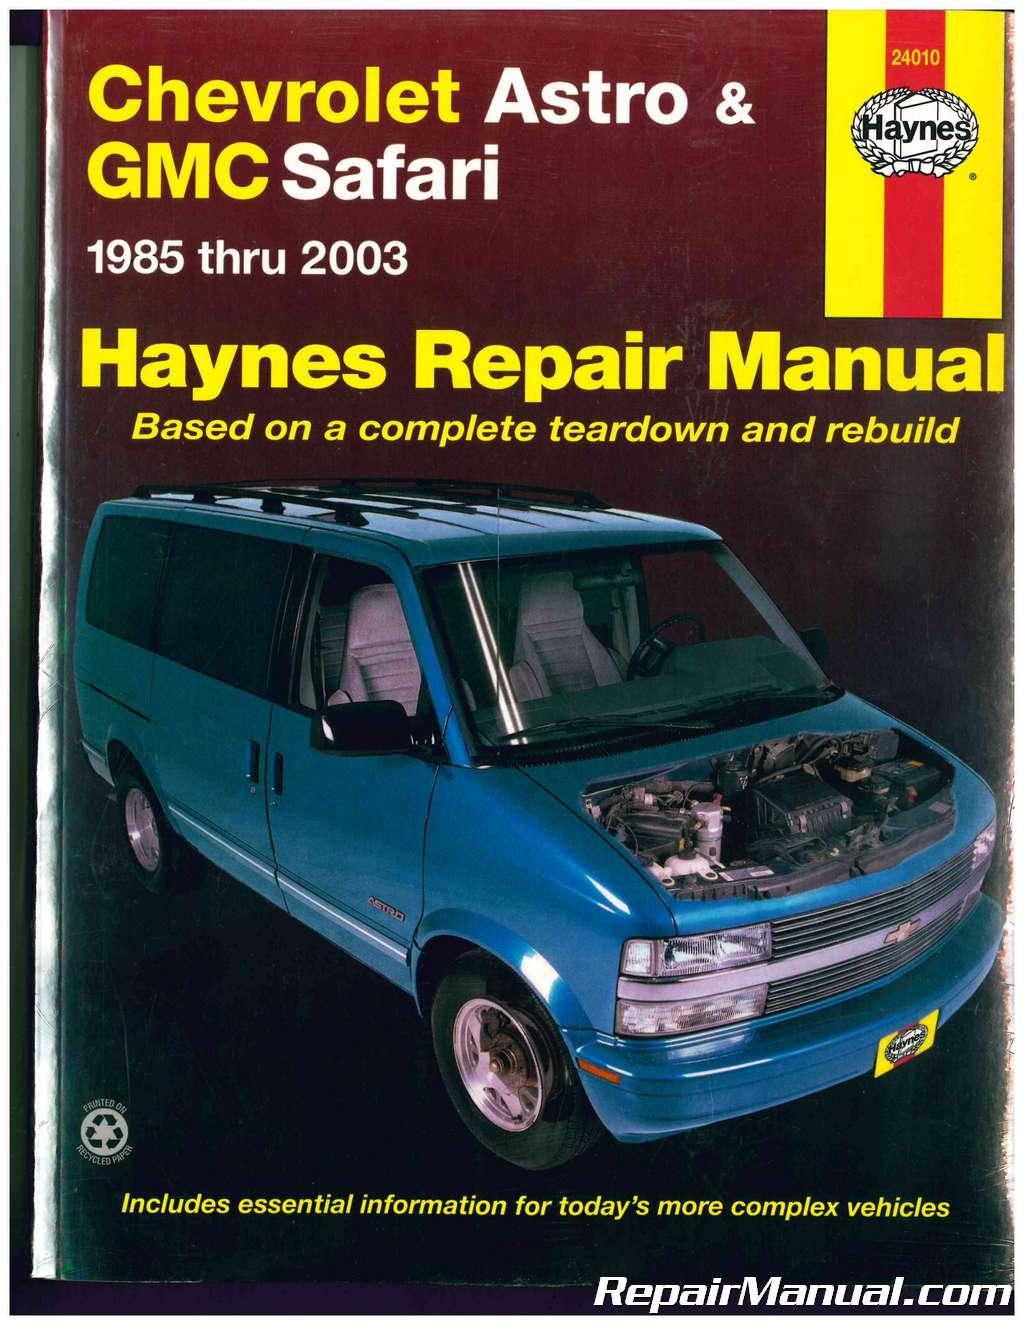 haynes chevrolet astro gmc safari mini vans 1985 2003 auto repair manual rh repairmanual com 1994 GMC Safari Dashboard 1994 GMC Safari XT